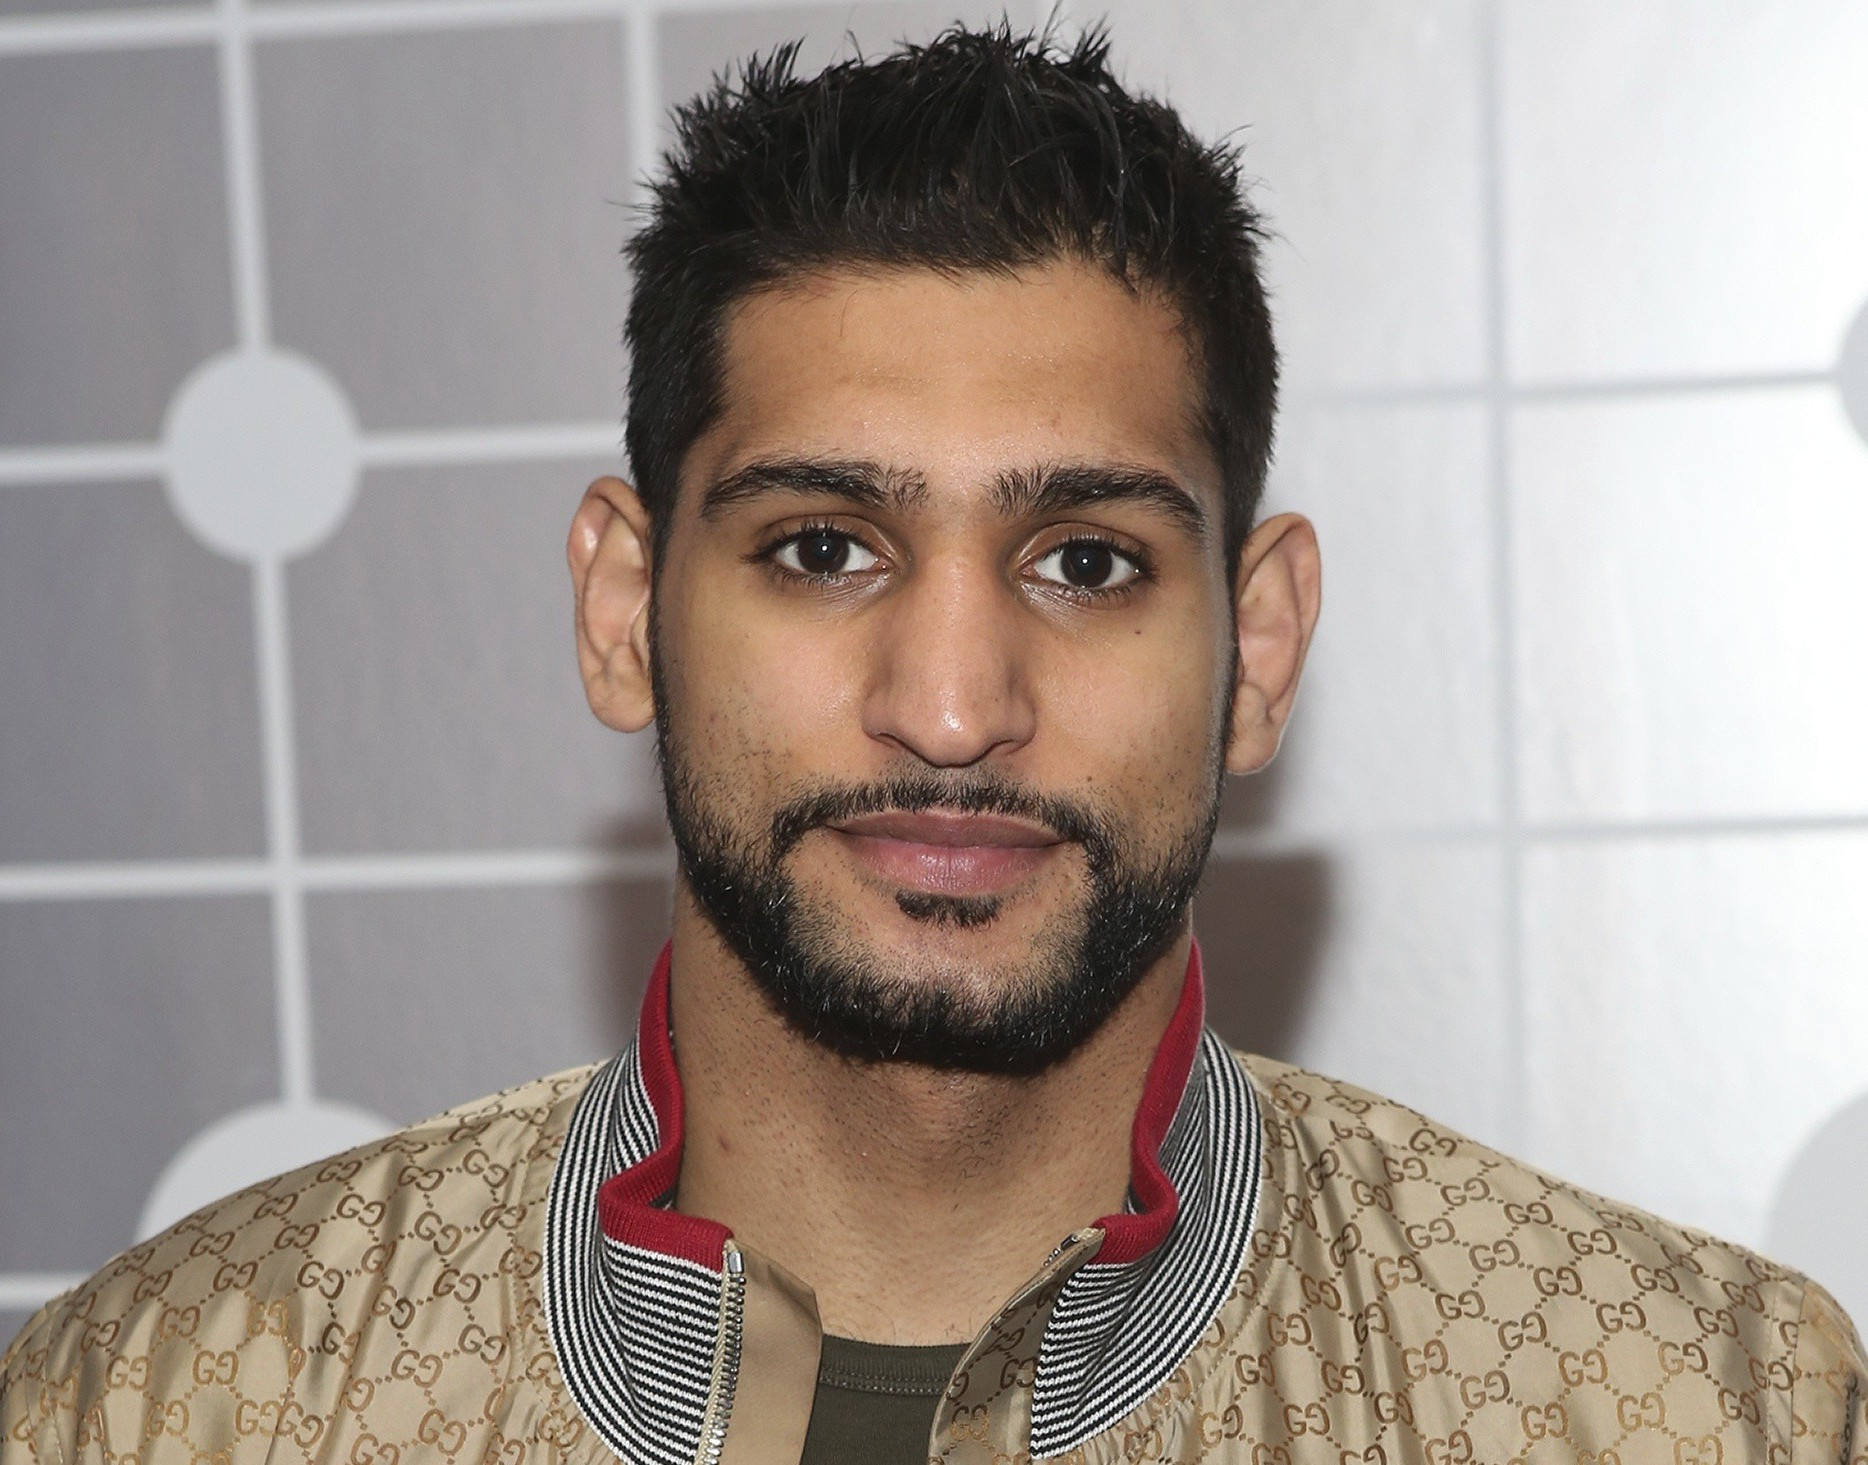 Звезда бокса приедет в Пакистан на место теракта